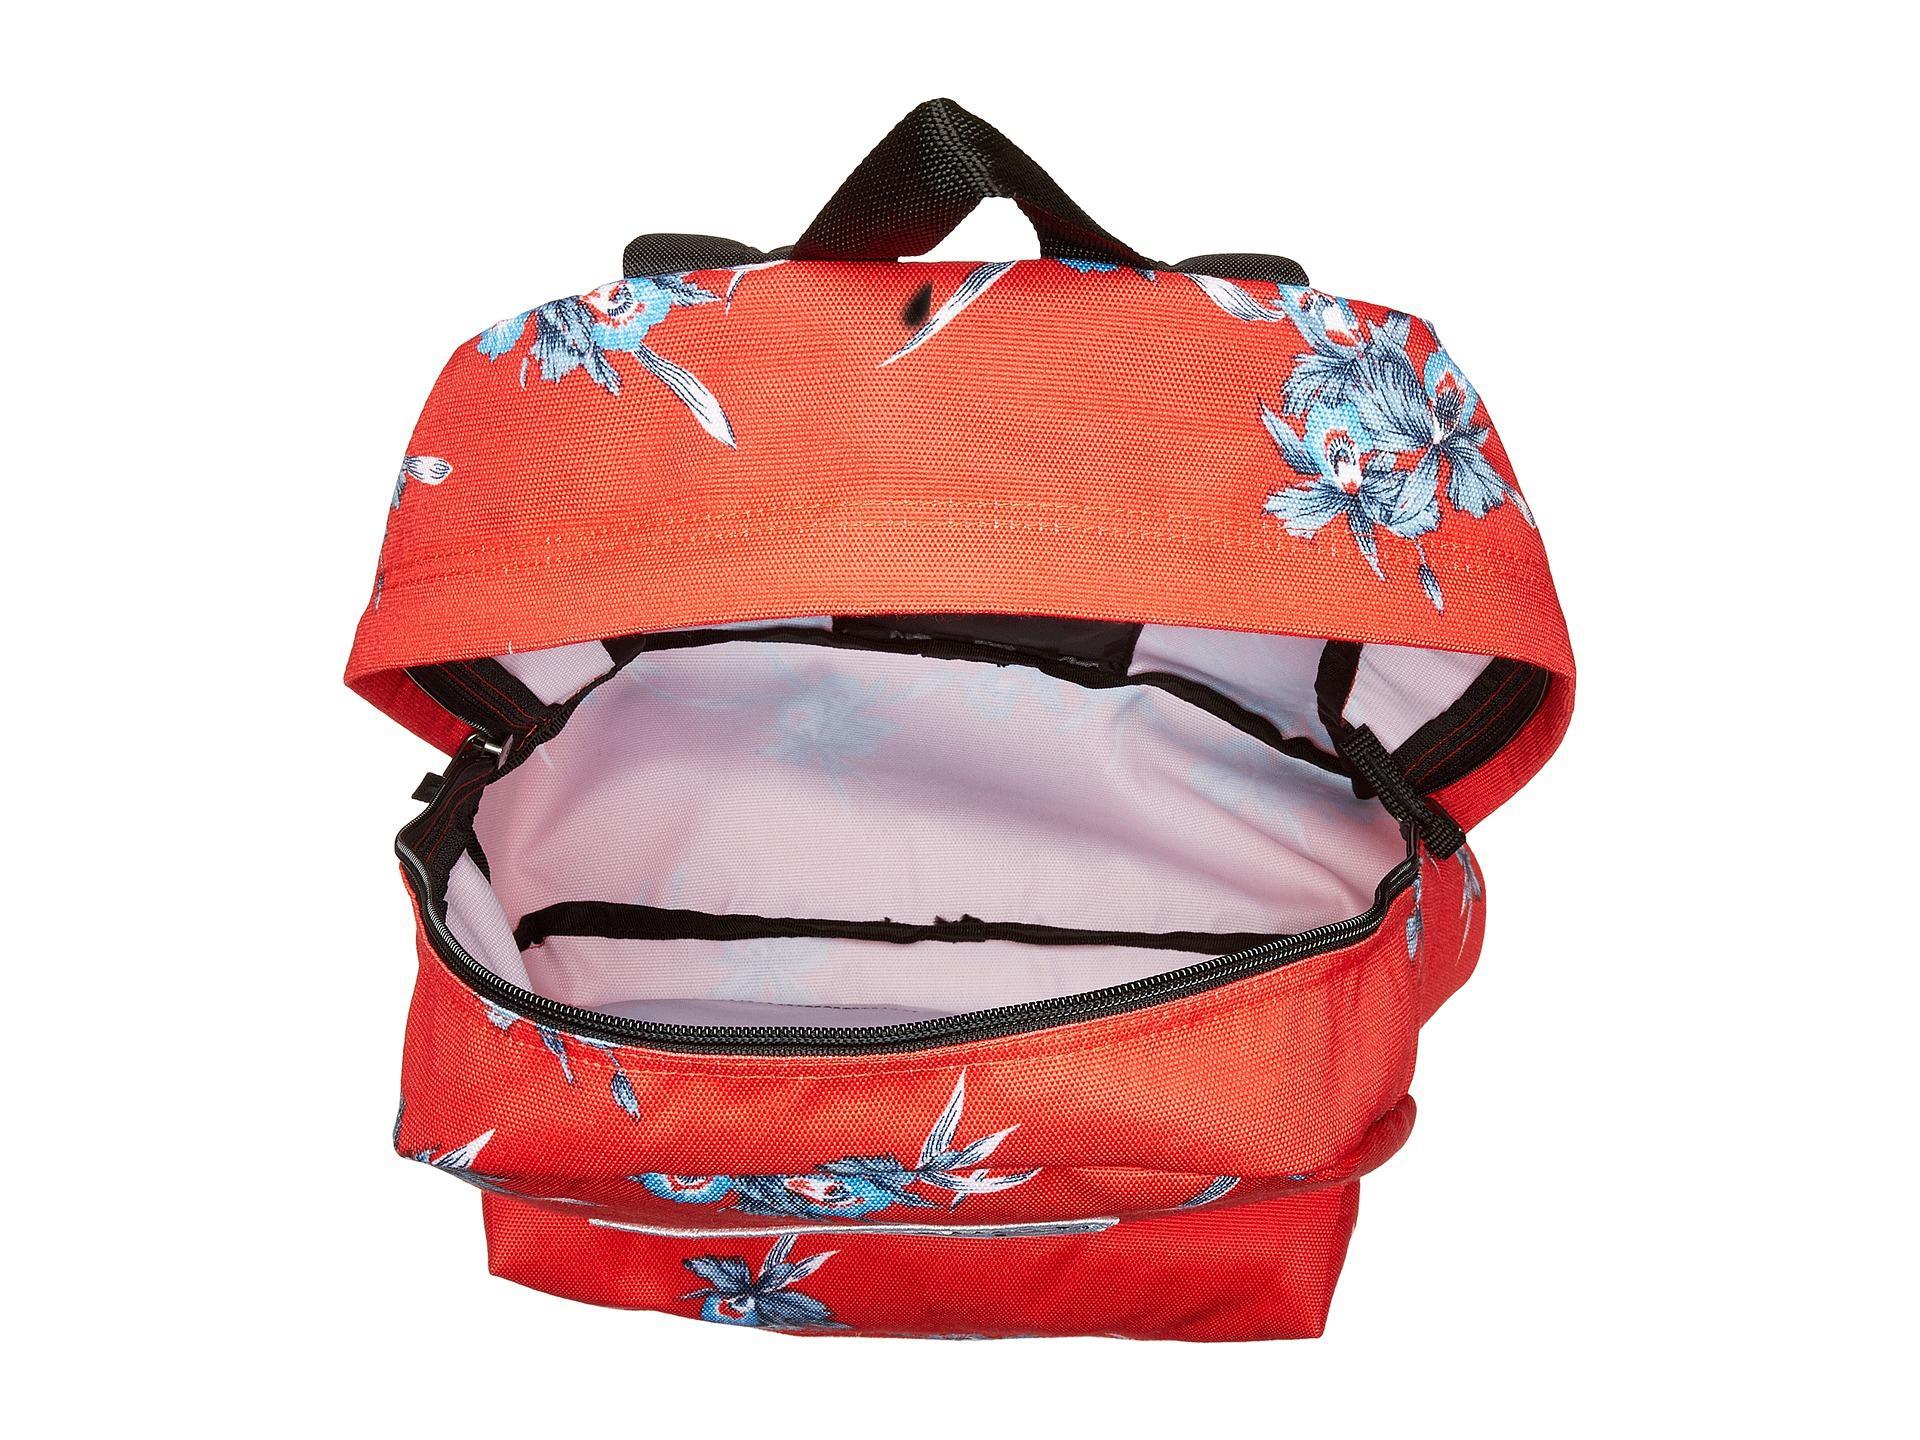 993bda063d Lyst - Vans Realm Backpack in Red